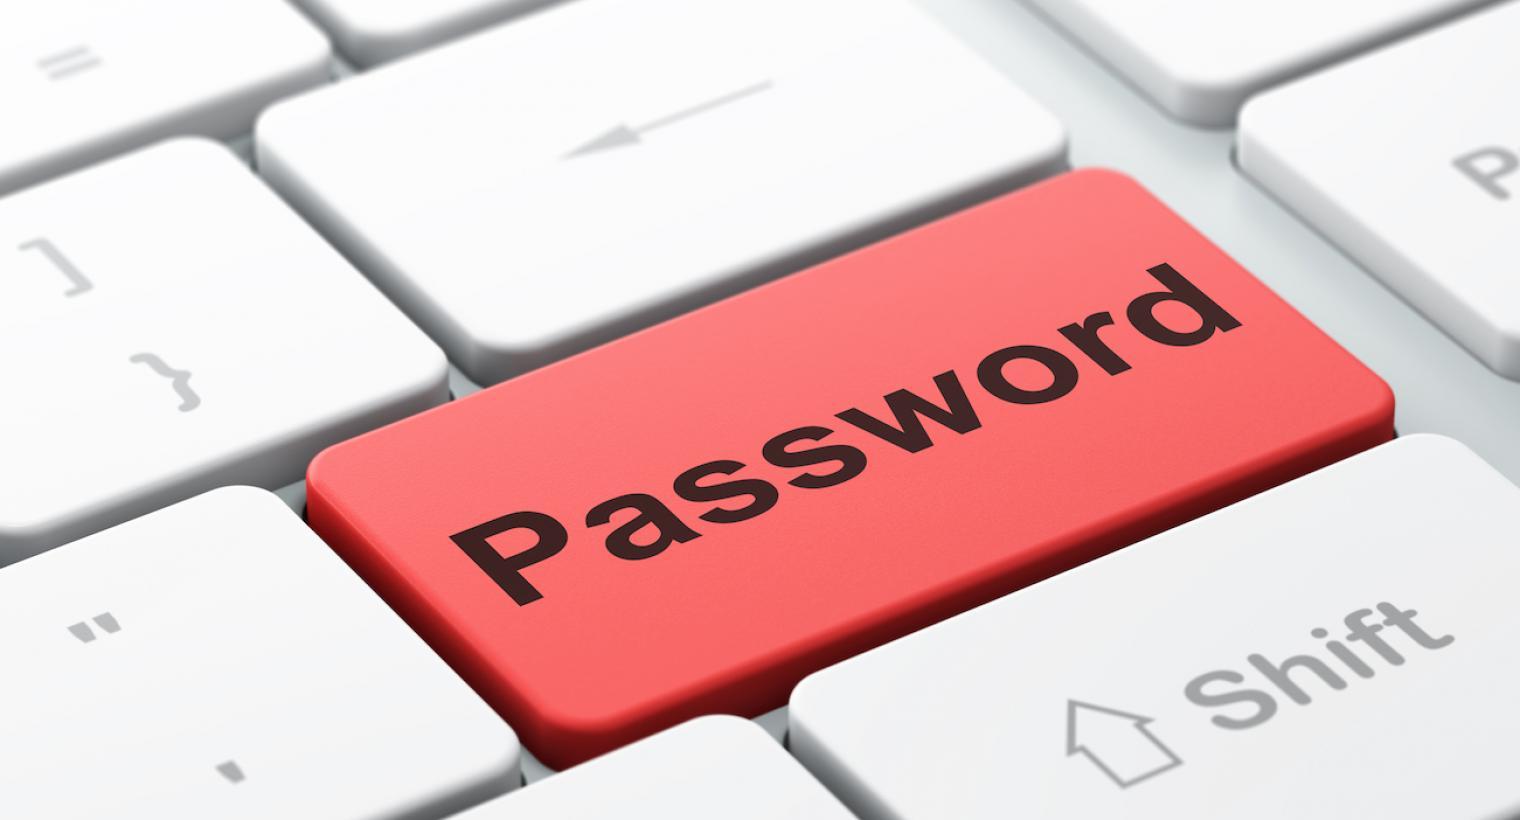 Клавиша на клавиатуре с надписью Password